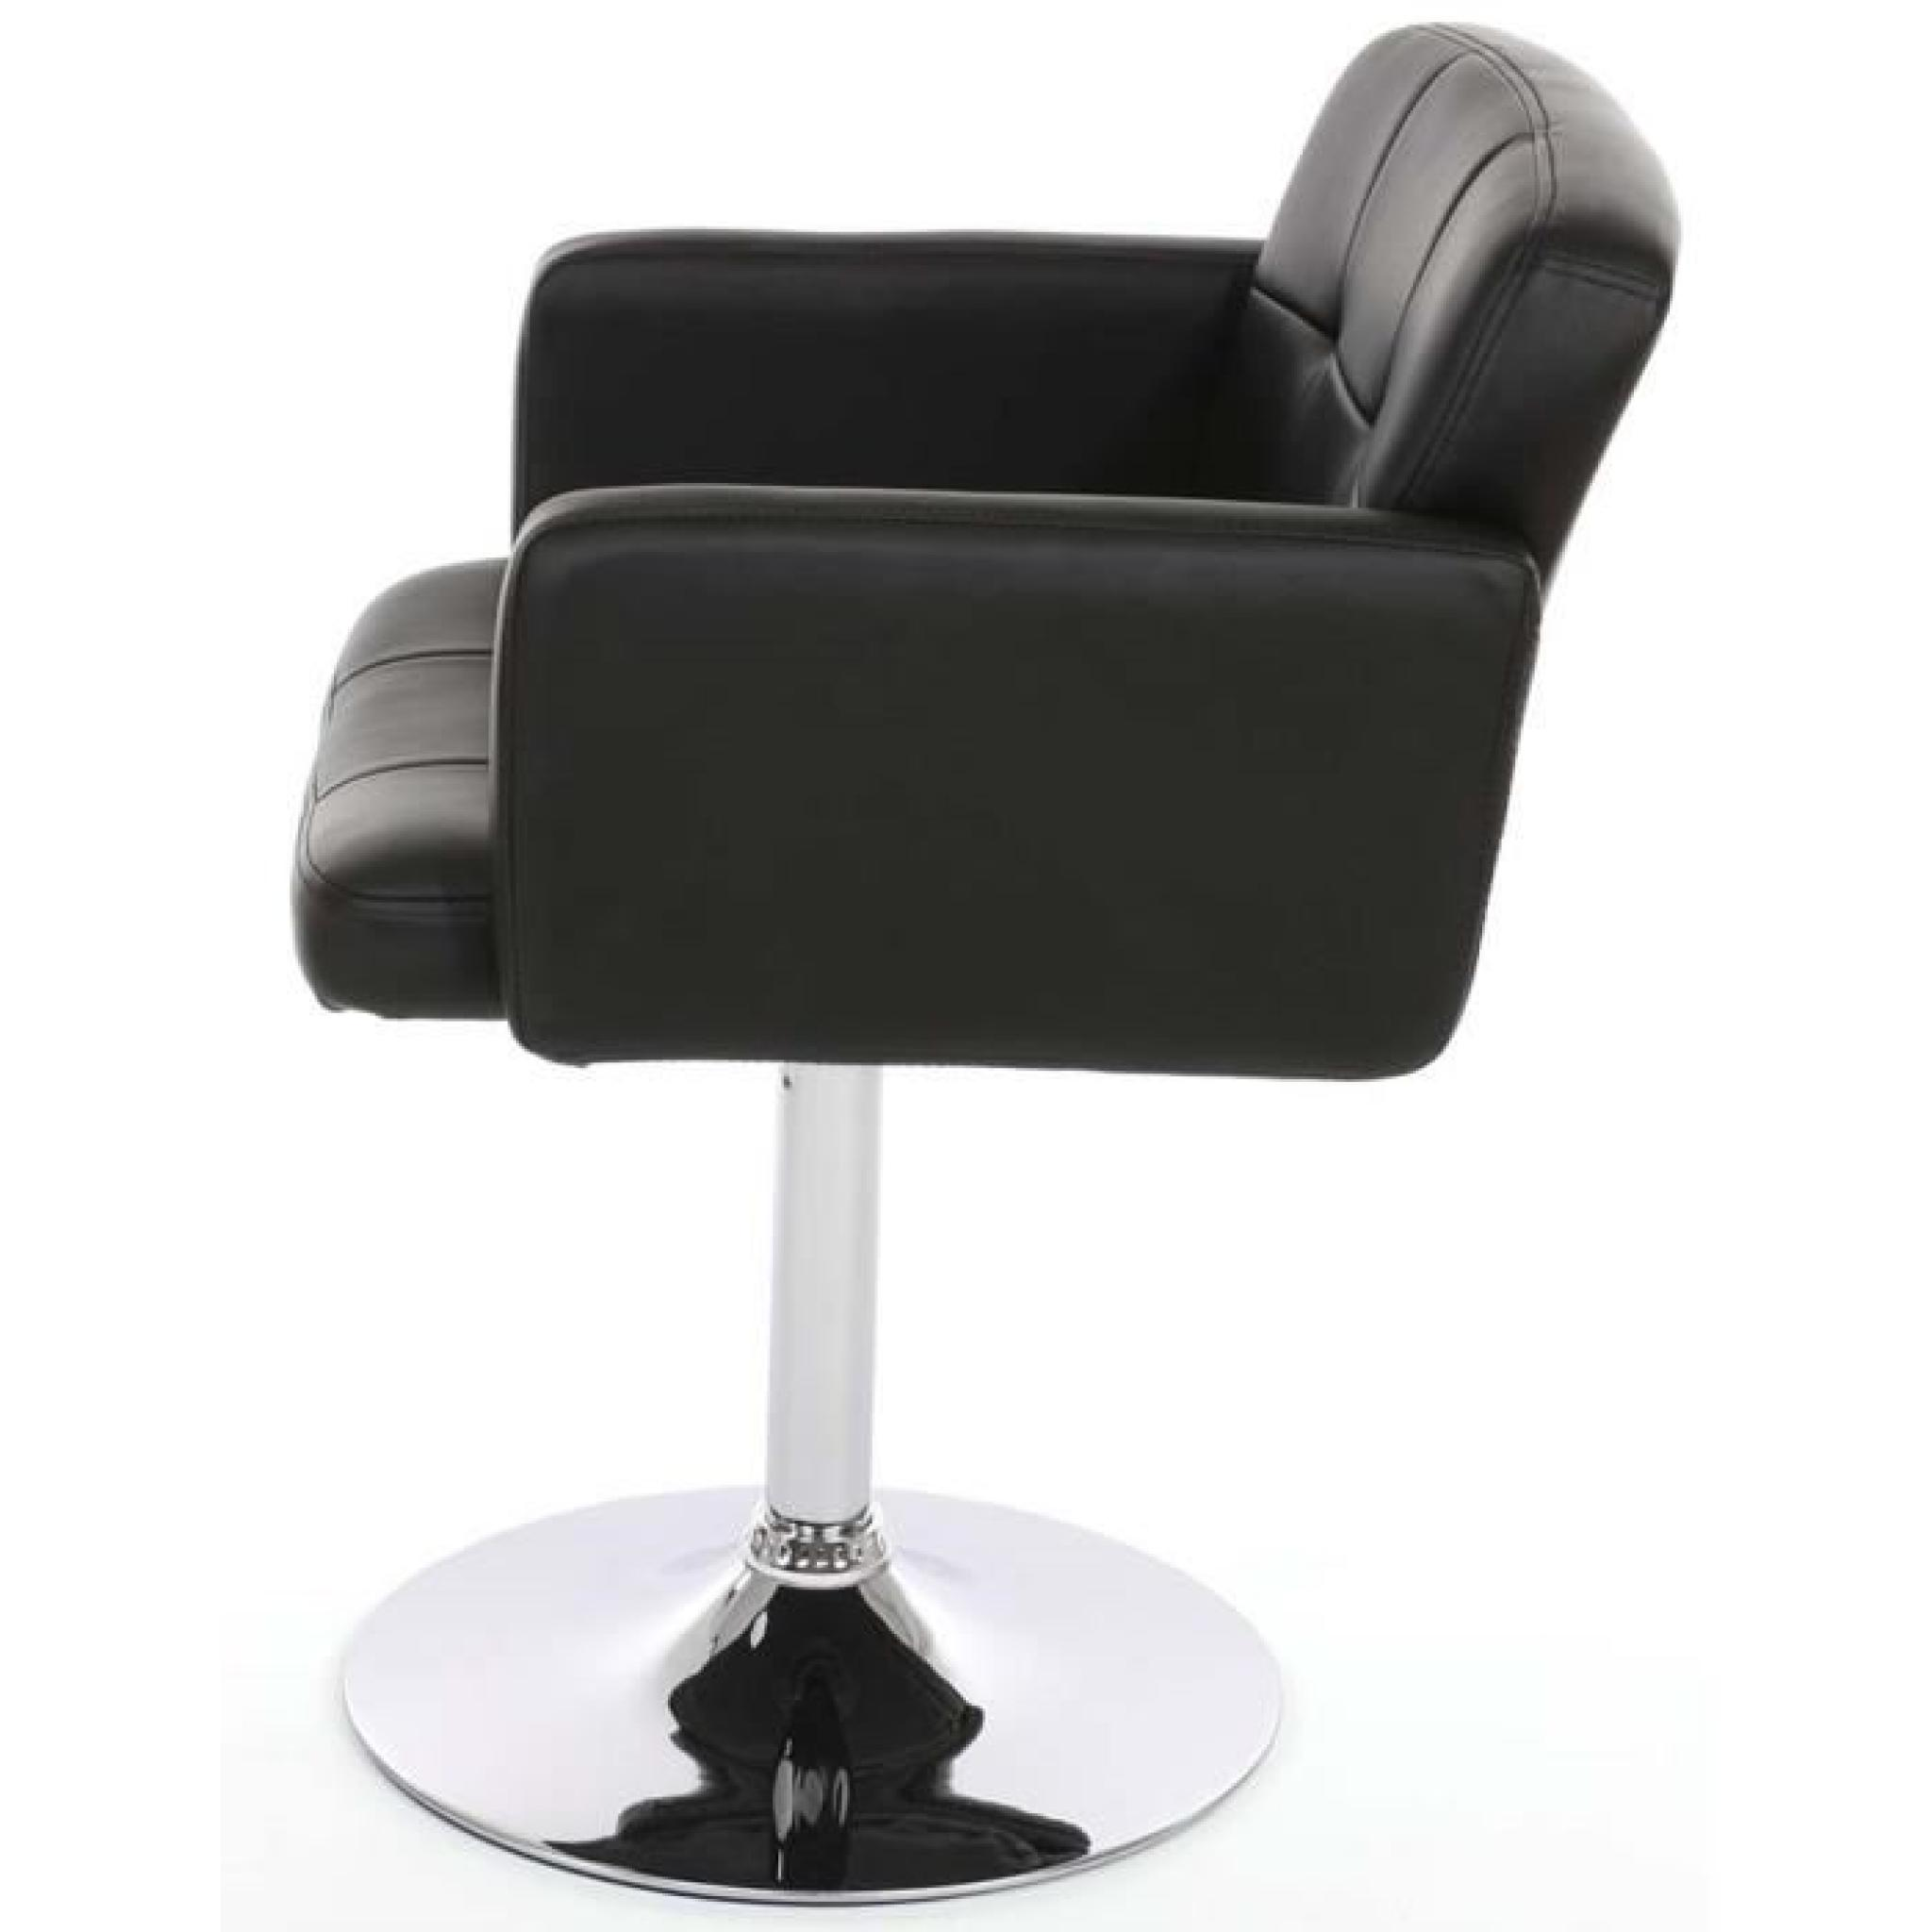 Chaise Salon Pivotante Orlando En Simili Cuir N Pas Cher